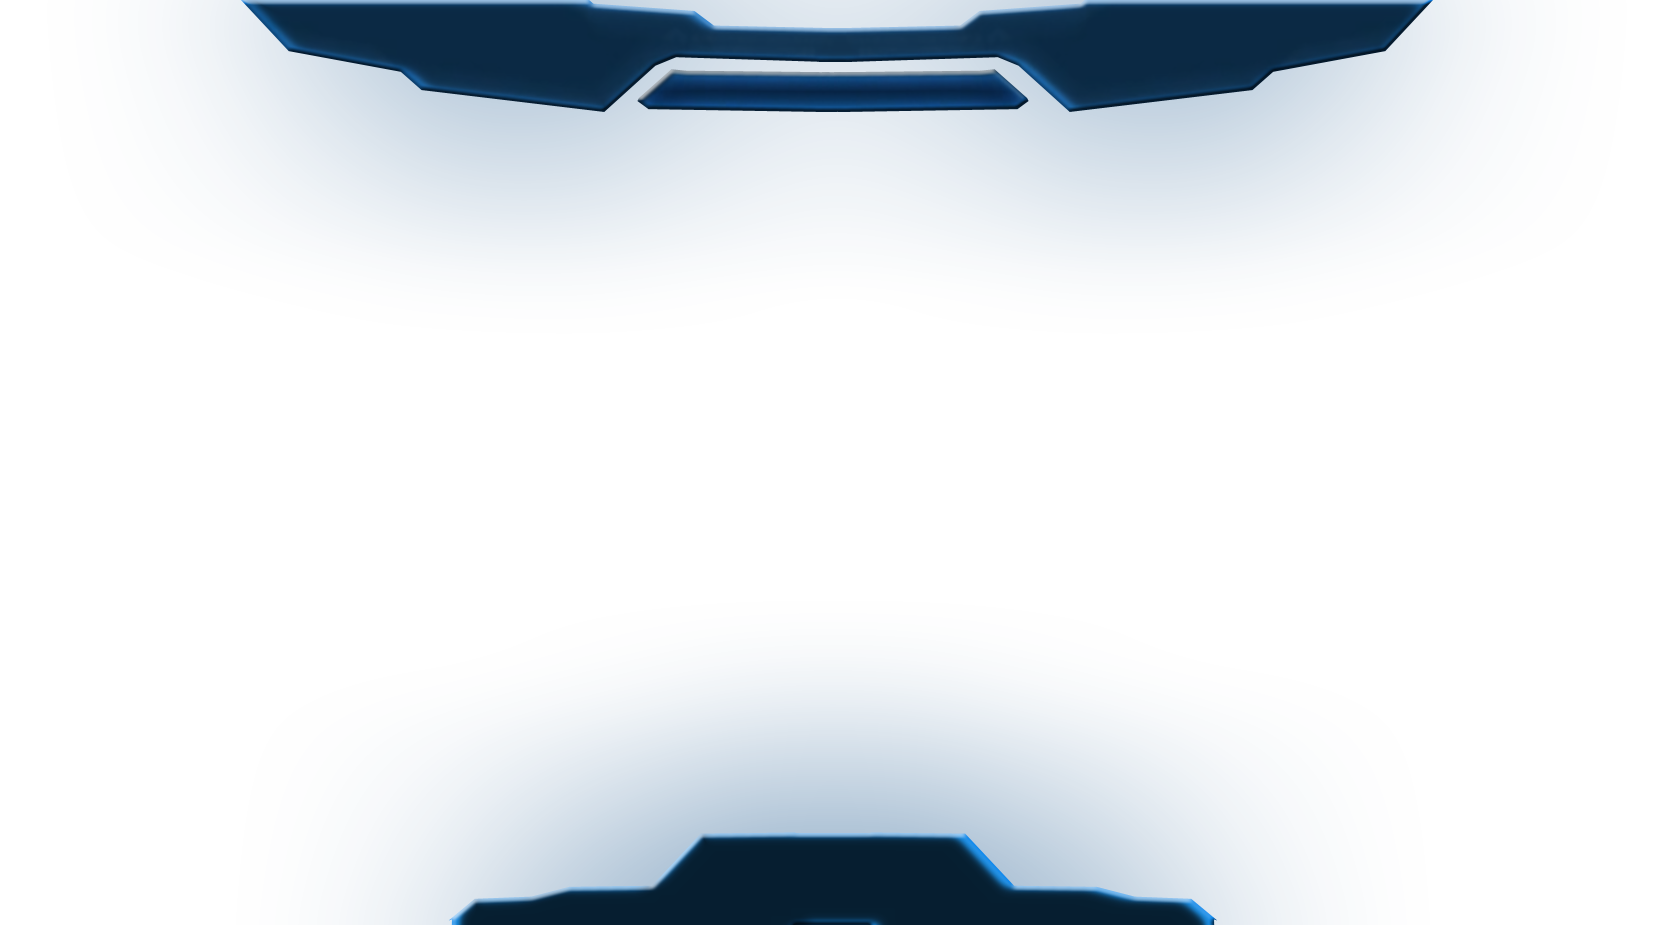 Halo 4 HUD With Health Bar by DaytonTN on DeviantArt